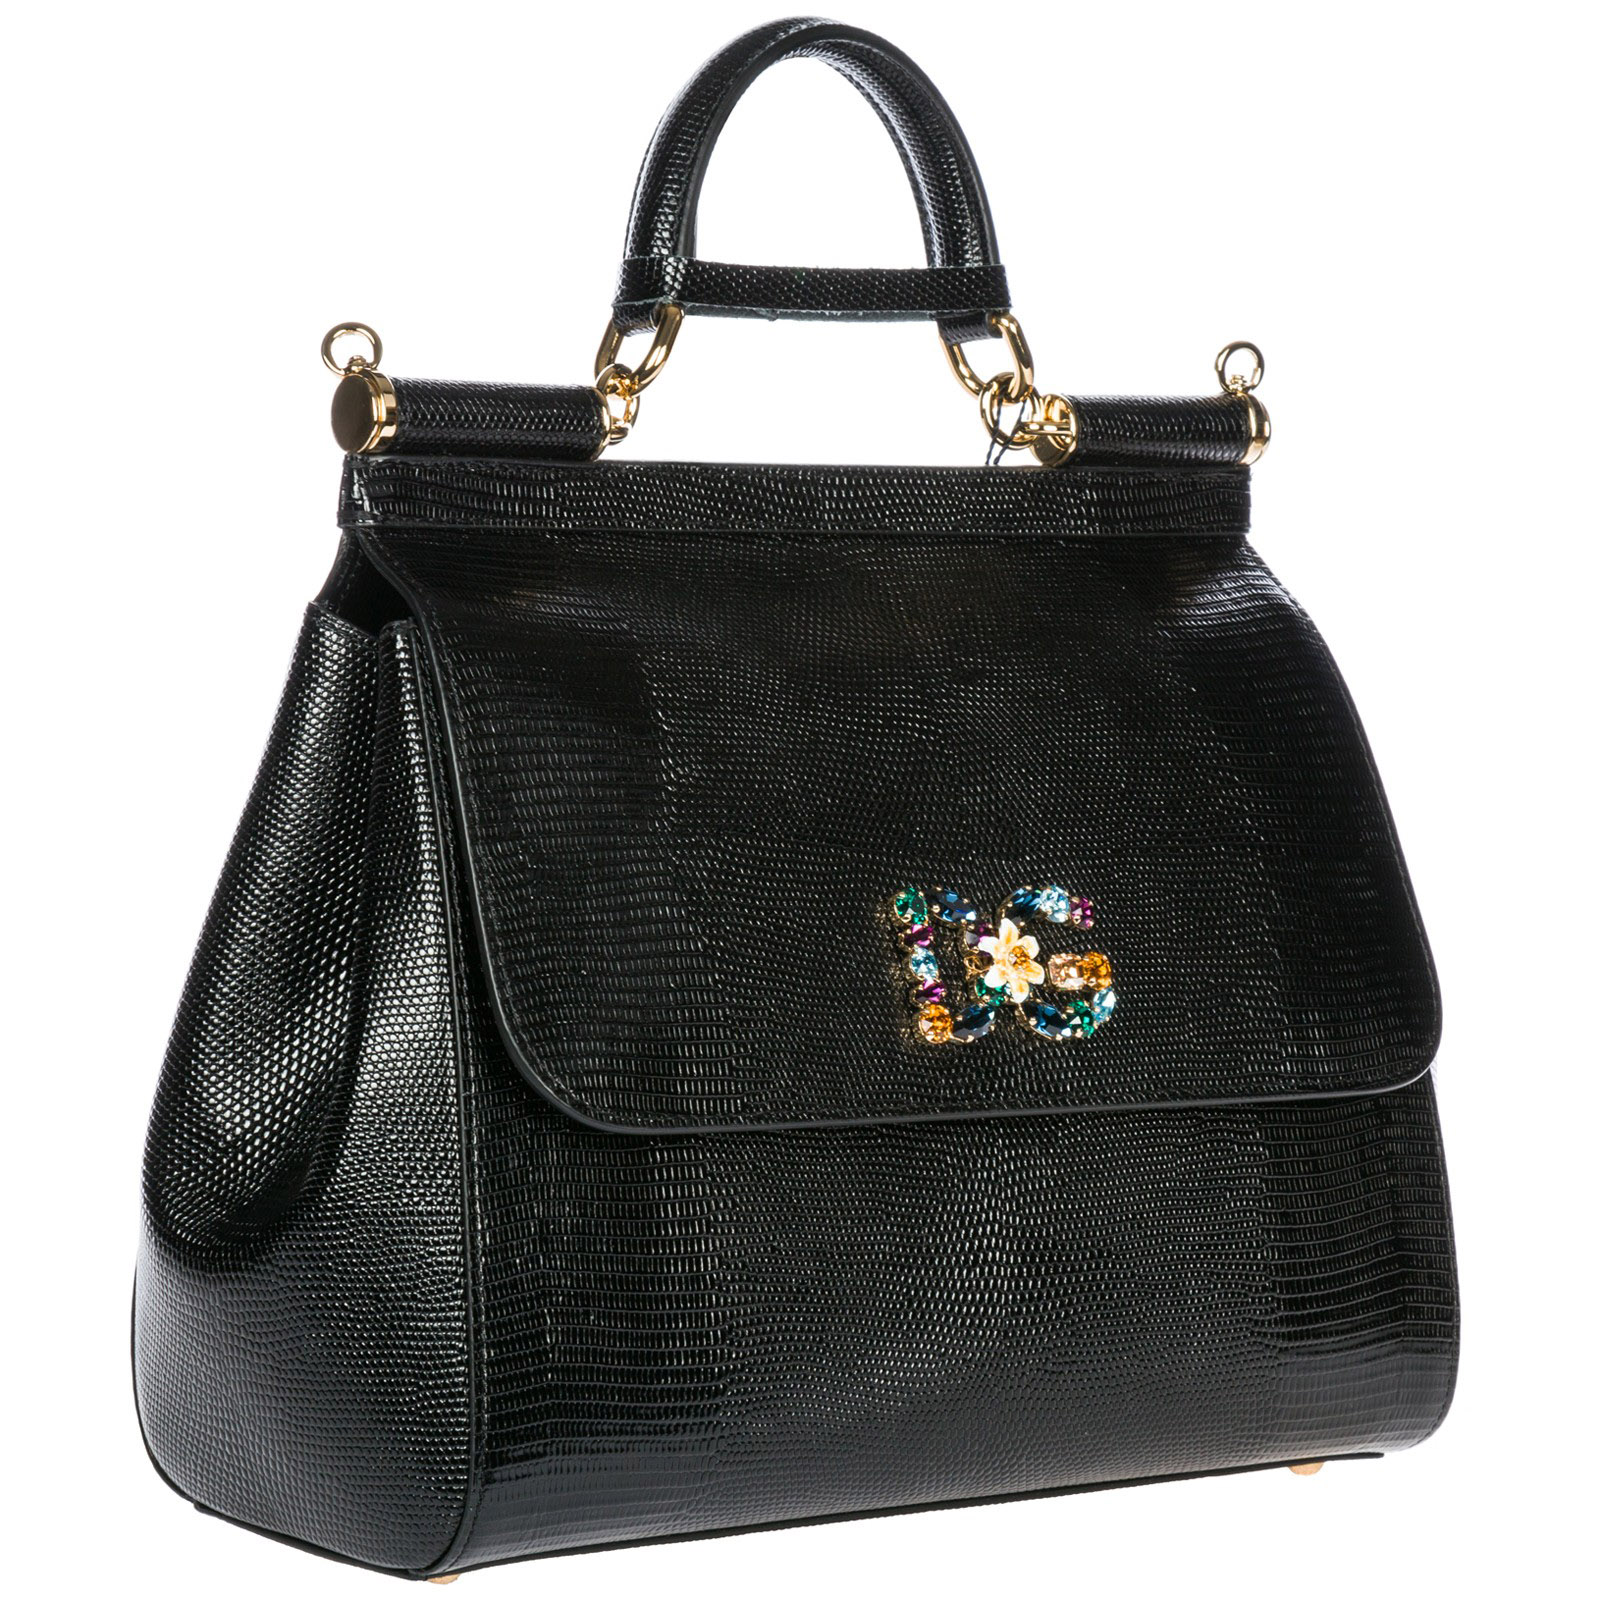 ... Women s leather handbag shopping bag purse sicily ... 5a0a4b471324